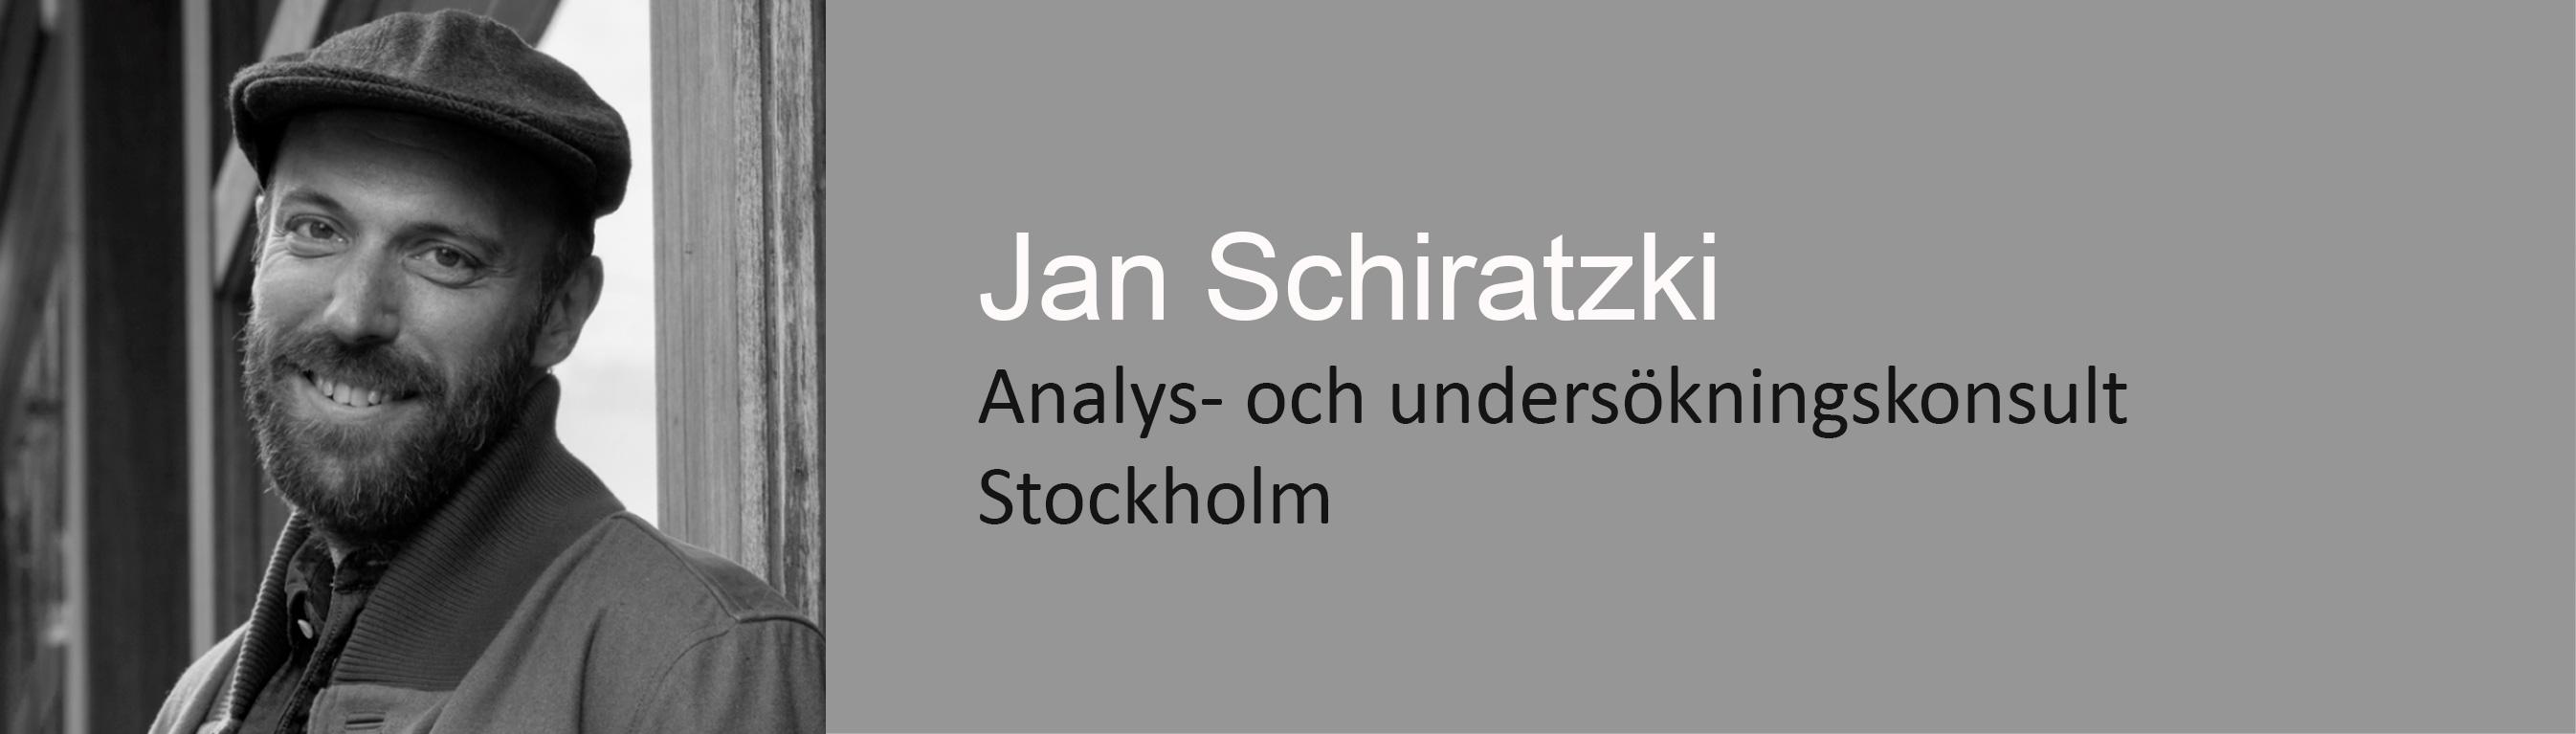 Jan Schiratzki, analys-och undersökningskonsult